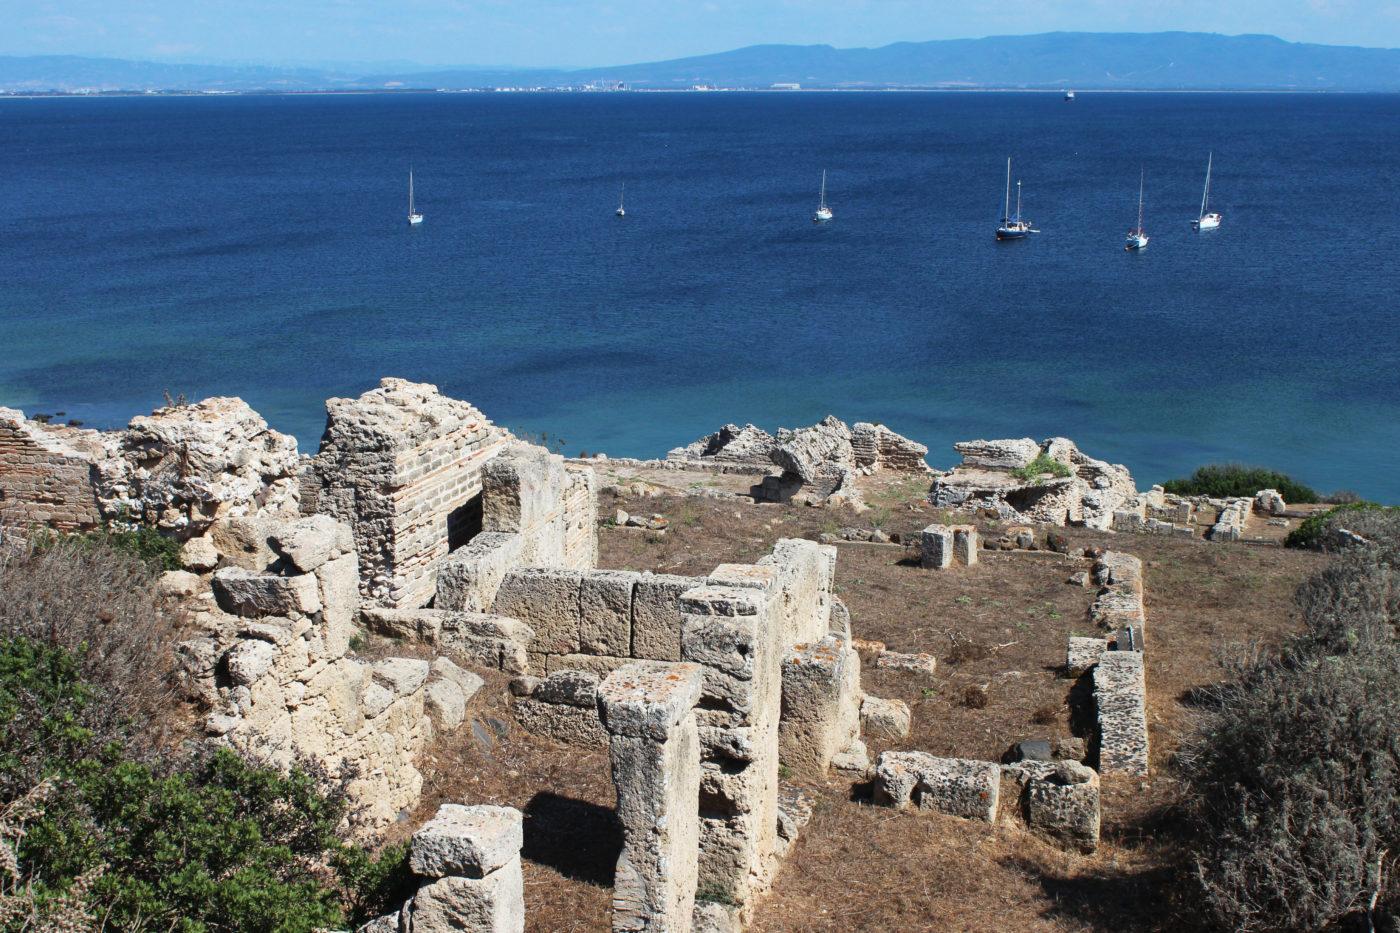 Sardegna Da Alghero ad Oristano area acheologica di tharros